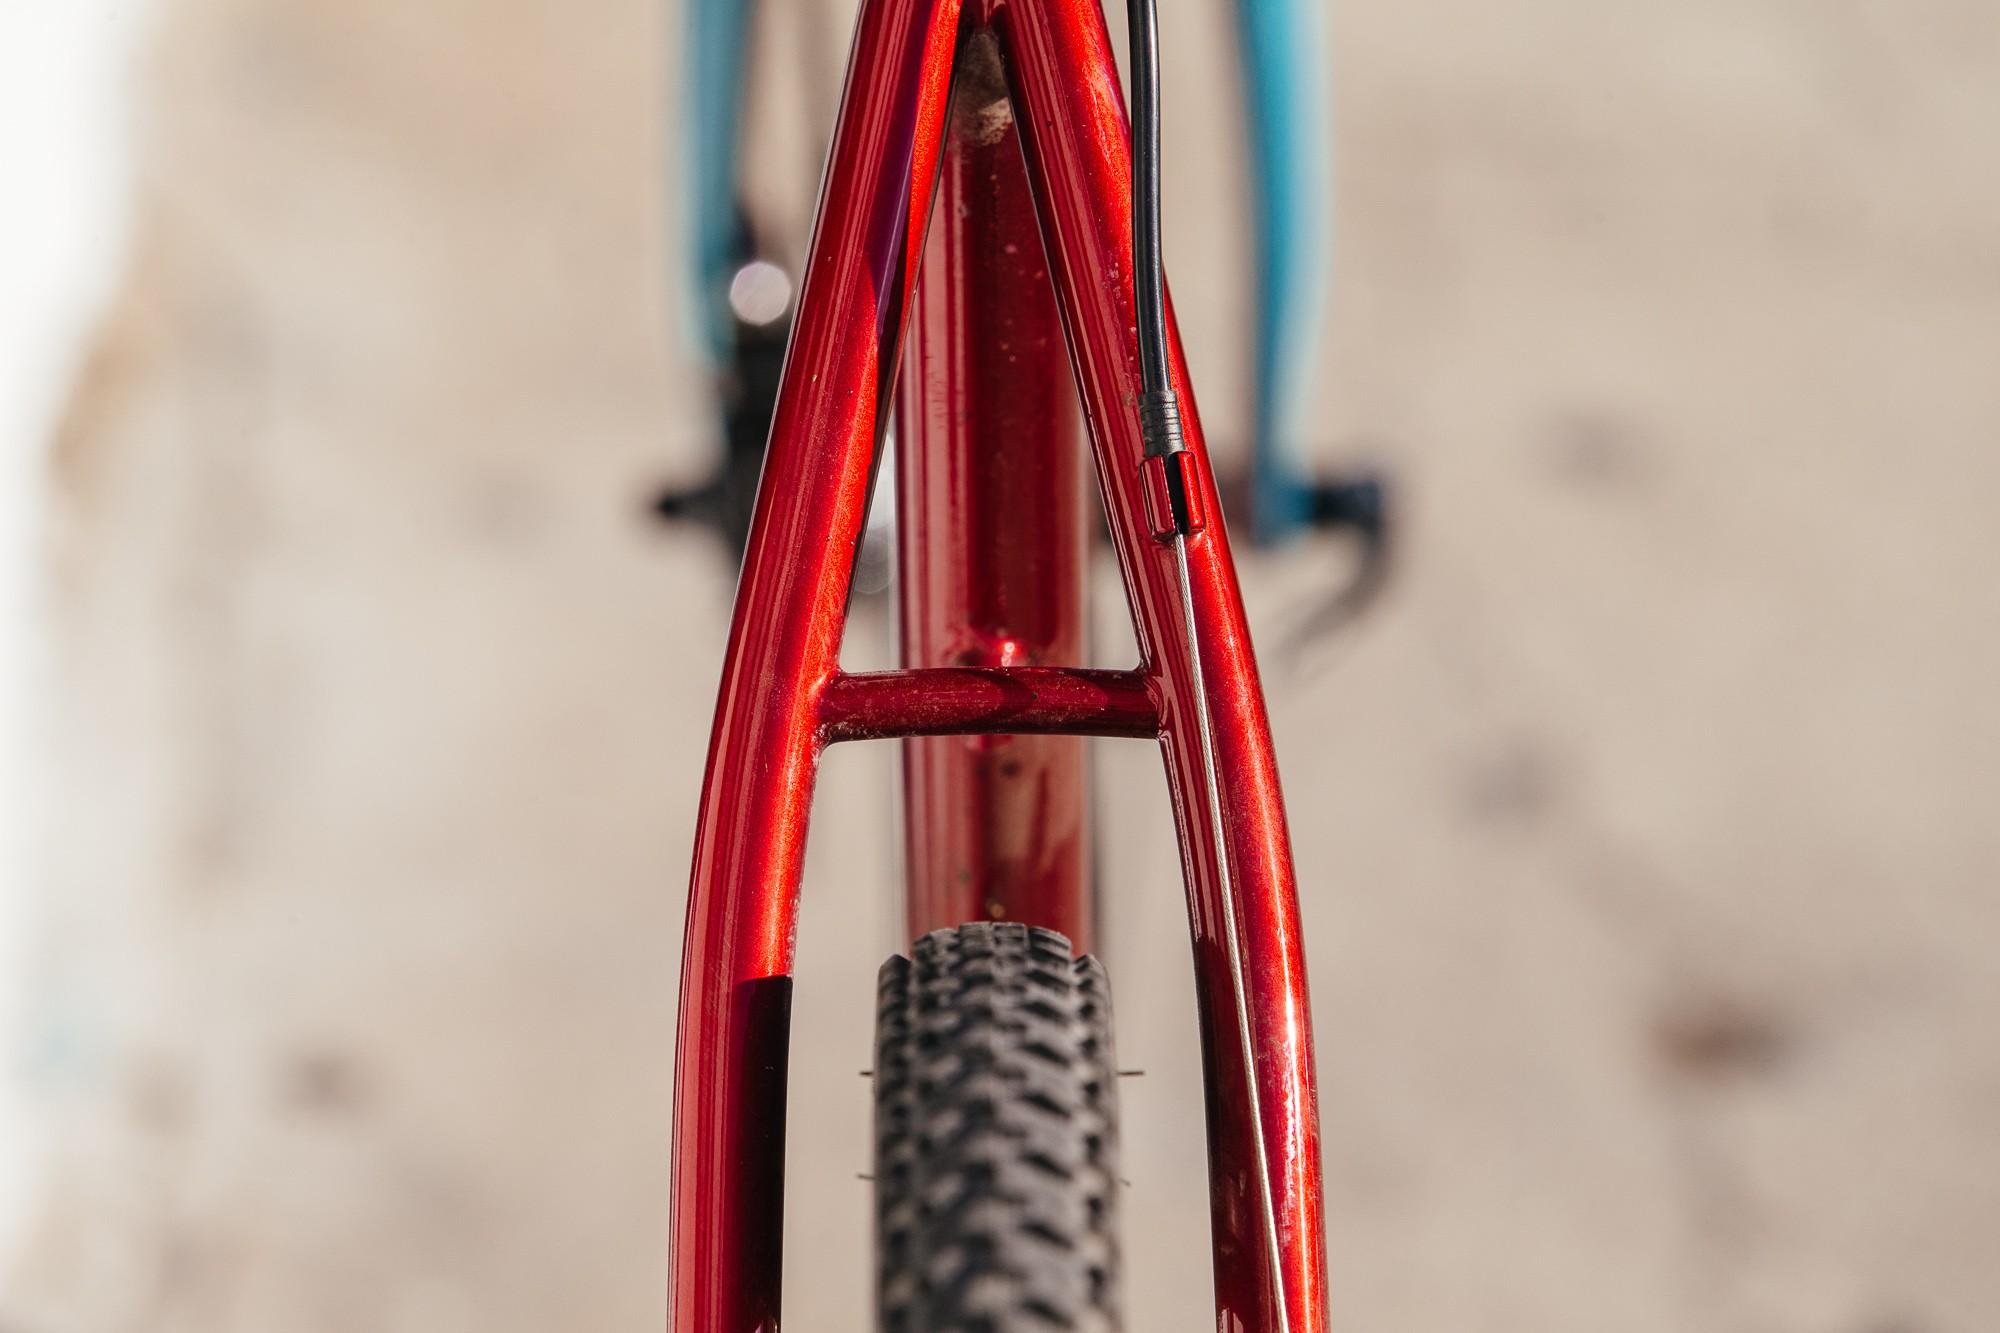 Ericas-Moth-Attack-CX-Team-Bike-9-1335x890@2x.jpg